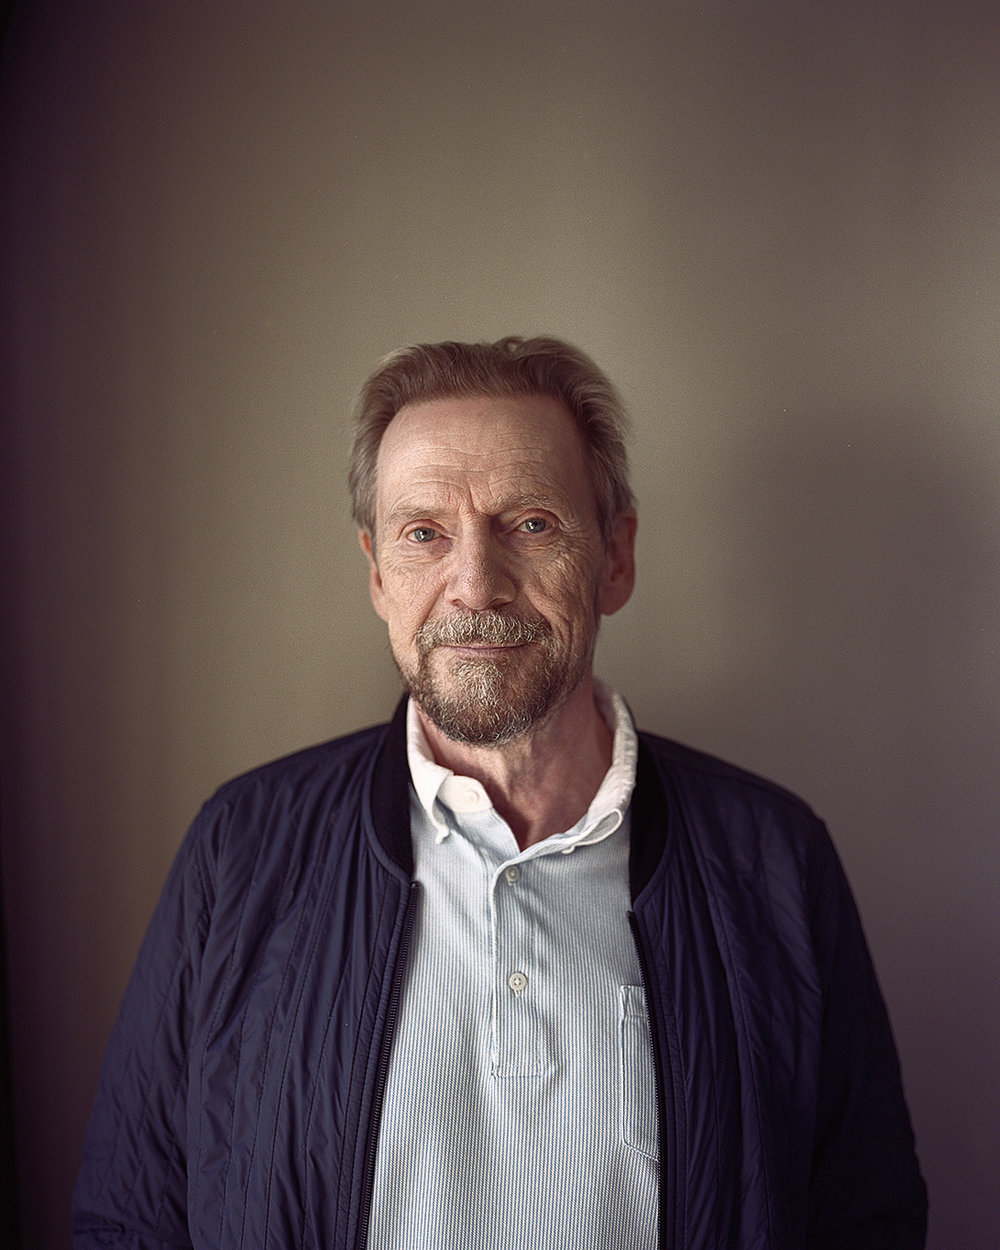 Chris Aadland Hotel Room Portraits